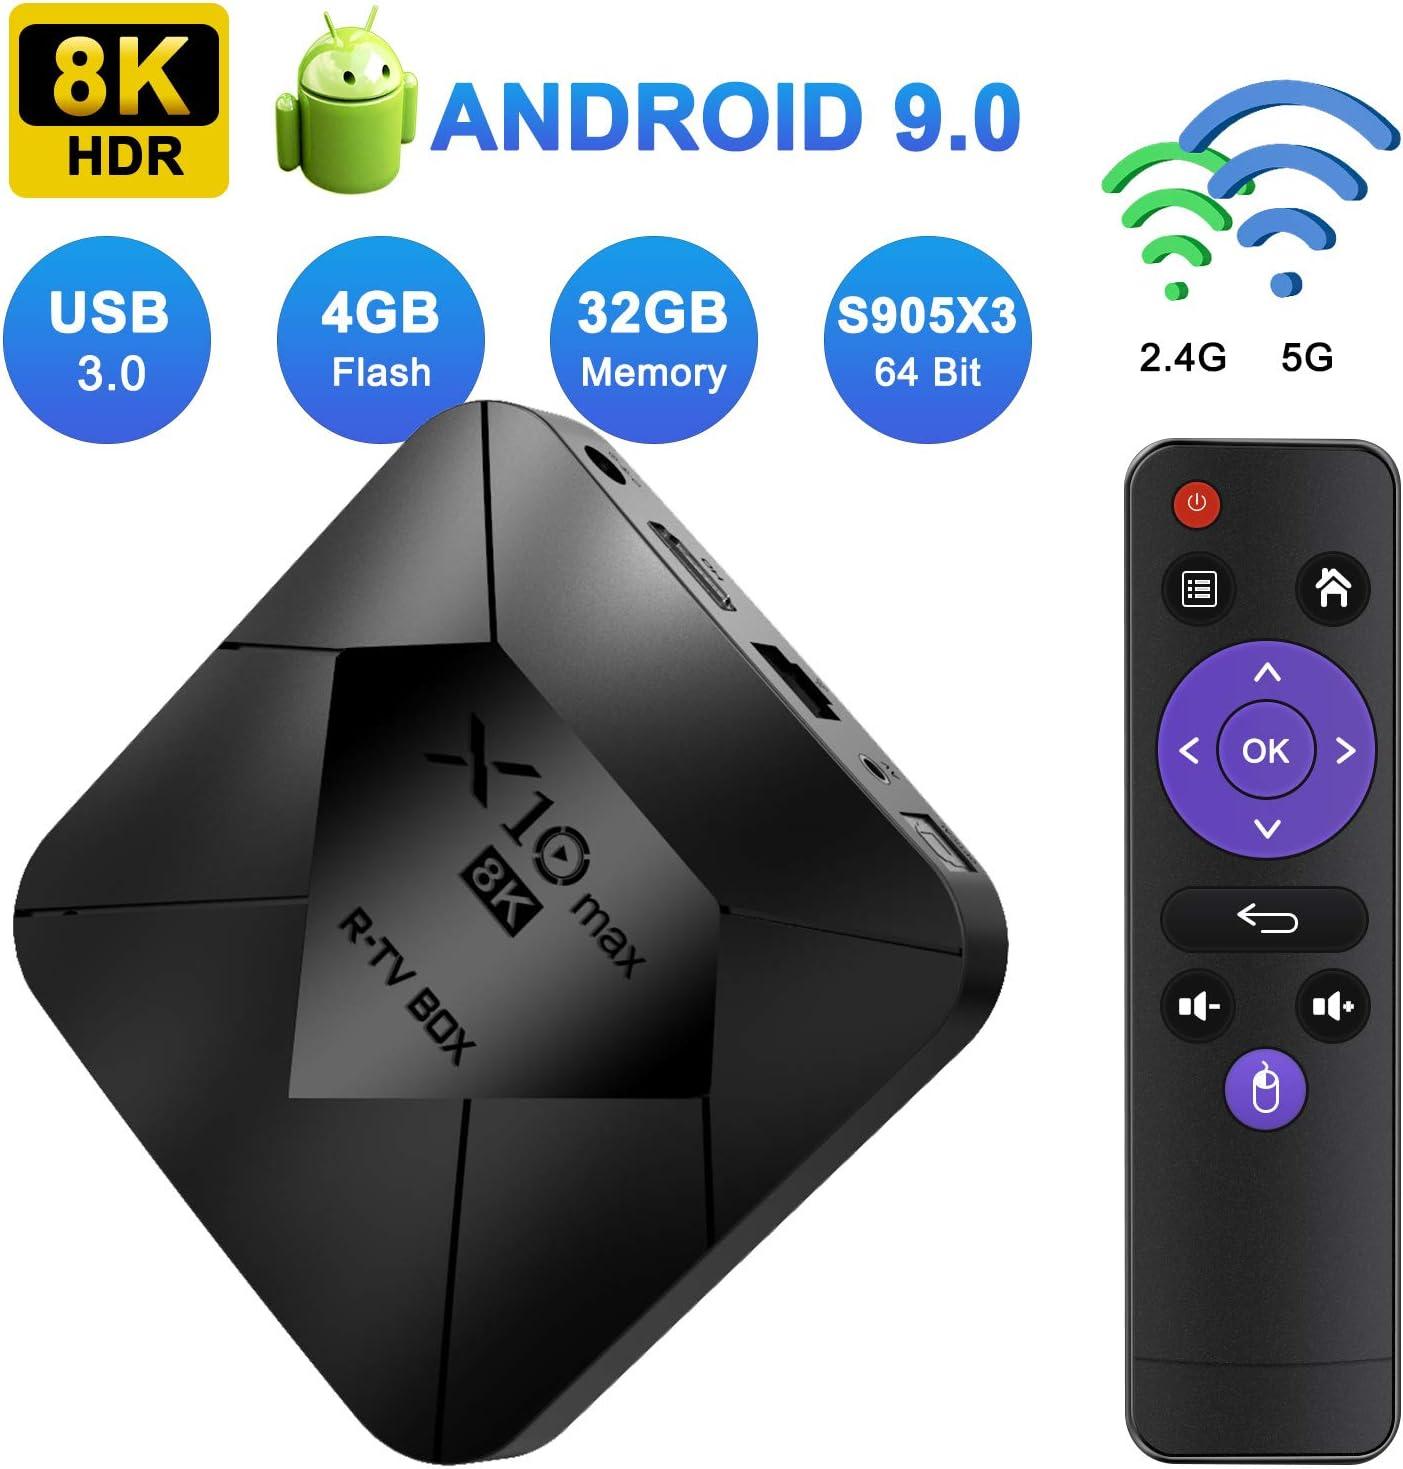 XGODY Smart TV Box X10 MAX,Android 9.0 TV Box con S905X3 Quad-Core Cortex-A55,8K HDR/ HDMI 2.1/ H.265/ USB 3.0 Smart Media Box,Bluetooth WiFi 2.4G/5G Streaming Box: Amazon.es: Electrónica